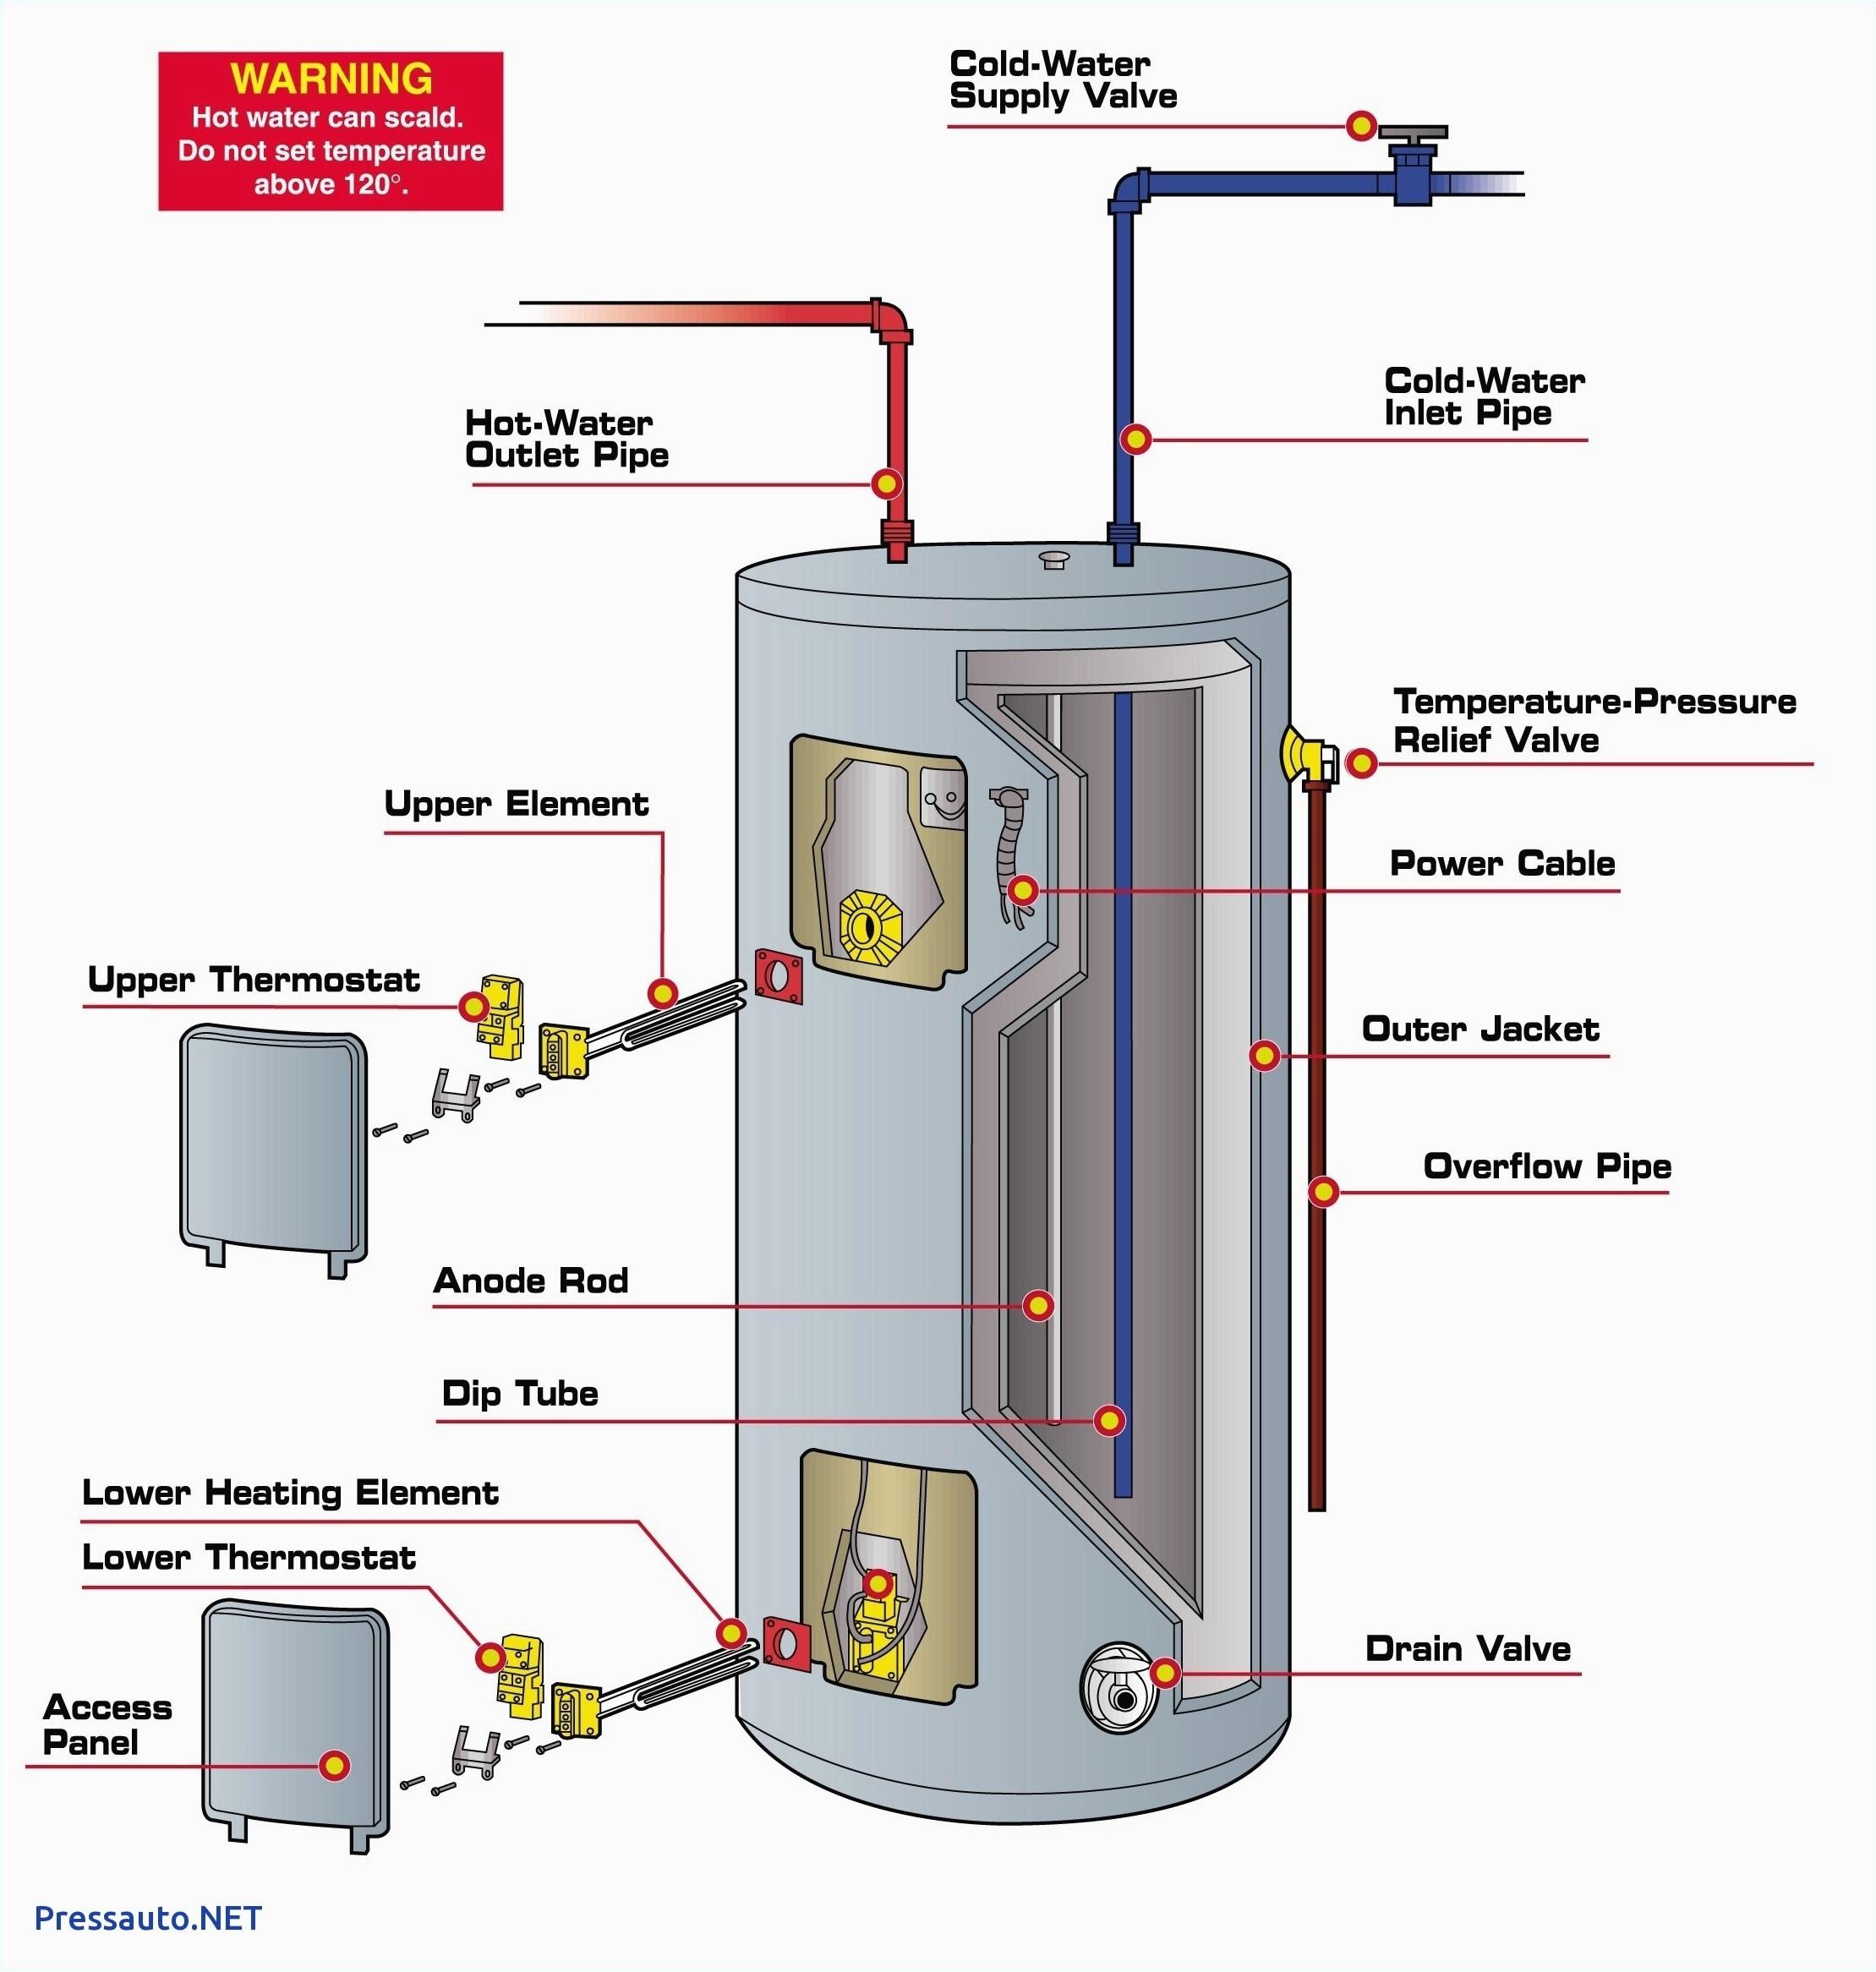 wiring diagram for rheem water heater wiring diagram megarheem water heater diagram wiring diagram expert wiring